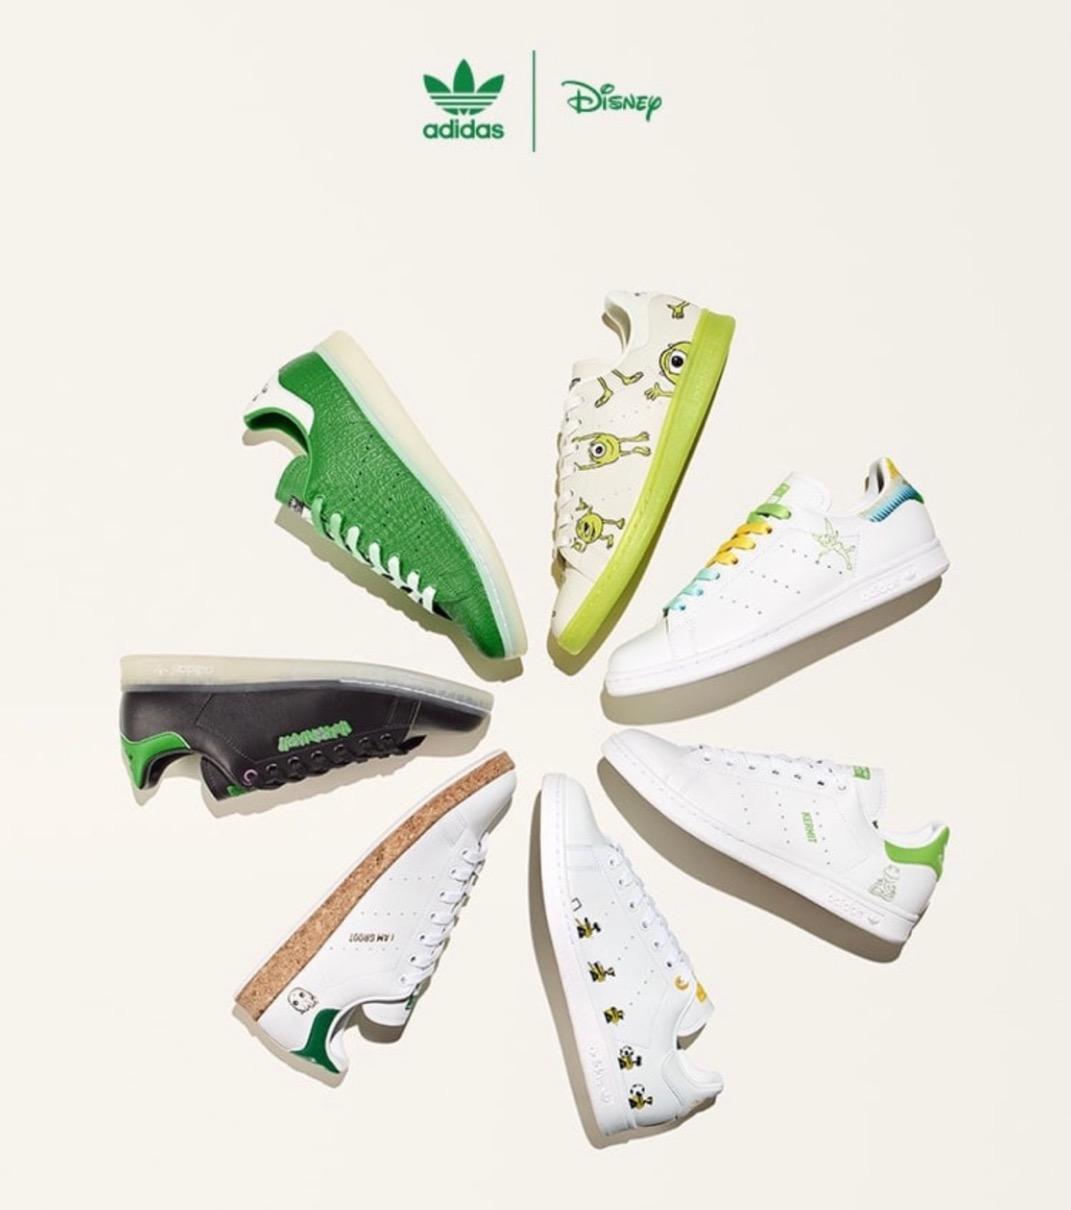 【adidas × Disney & Kermit & MARVEL】Stan Smith Collectionが国内4月4日/4月8日に発売予定